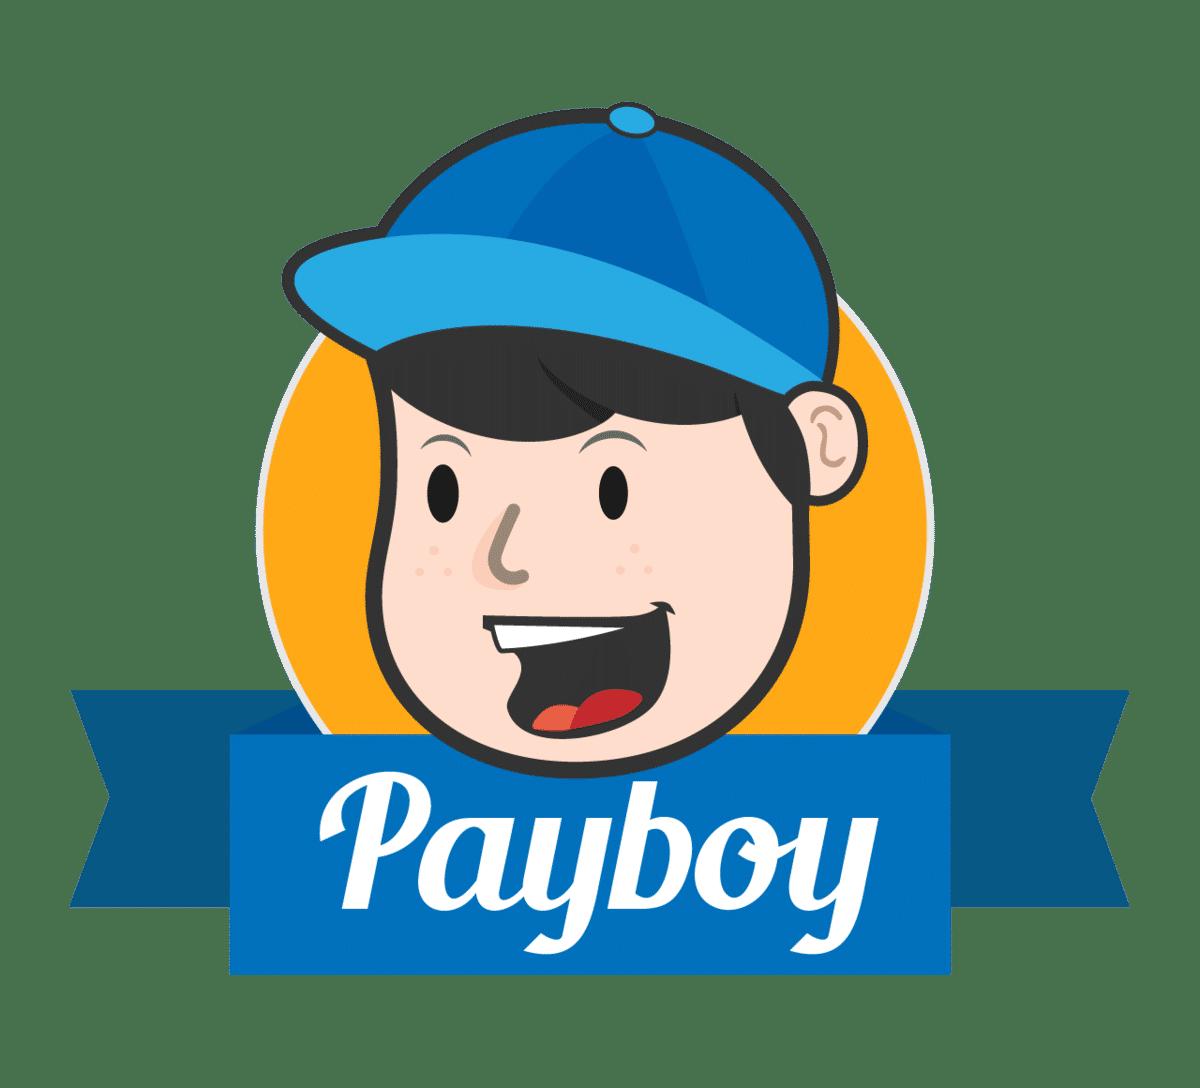 Payboy Pte. Ltd.